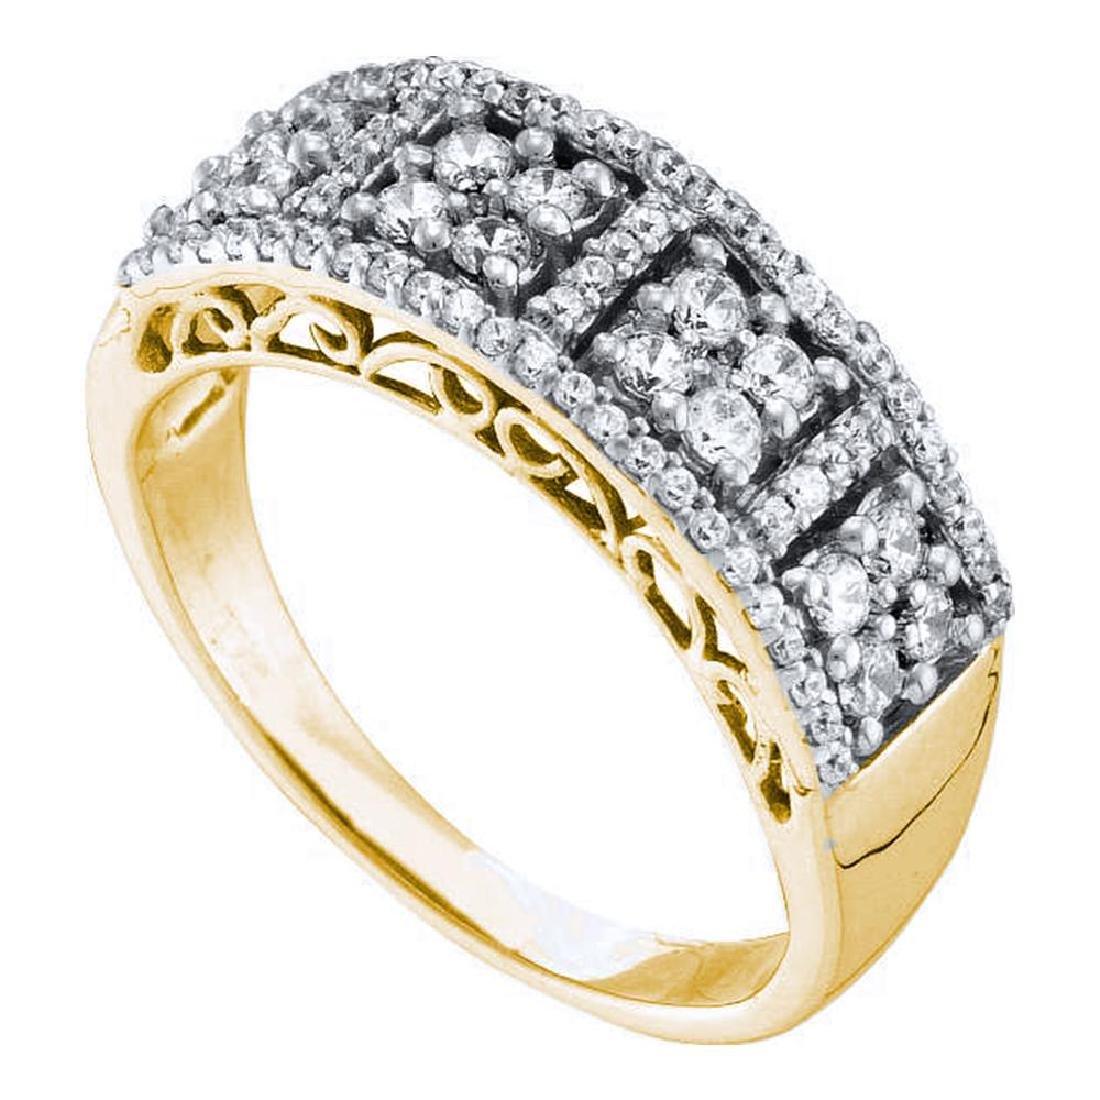 0.51 CTW Diamond Symmetrical Square Cluster Ring 14KT